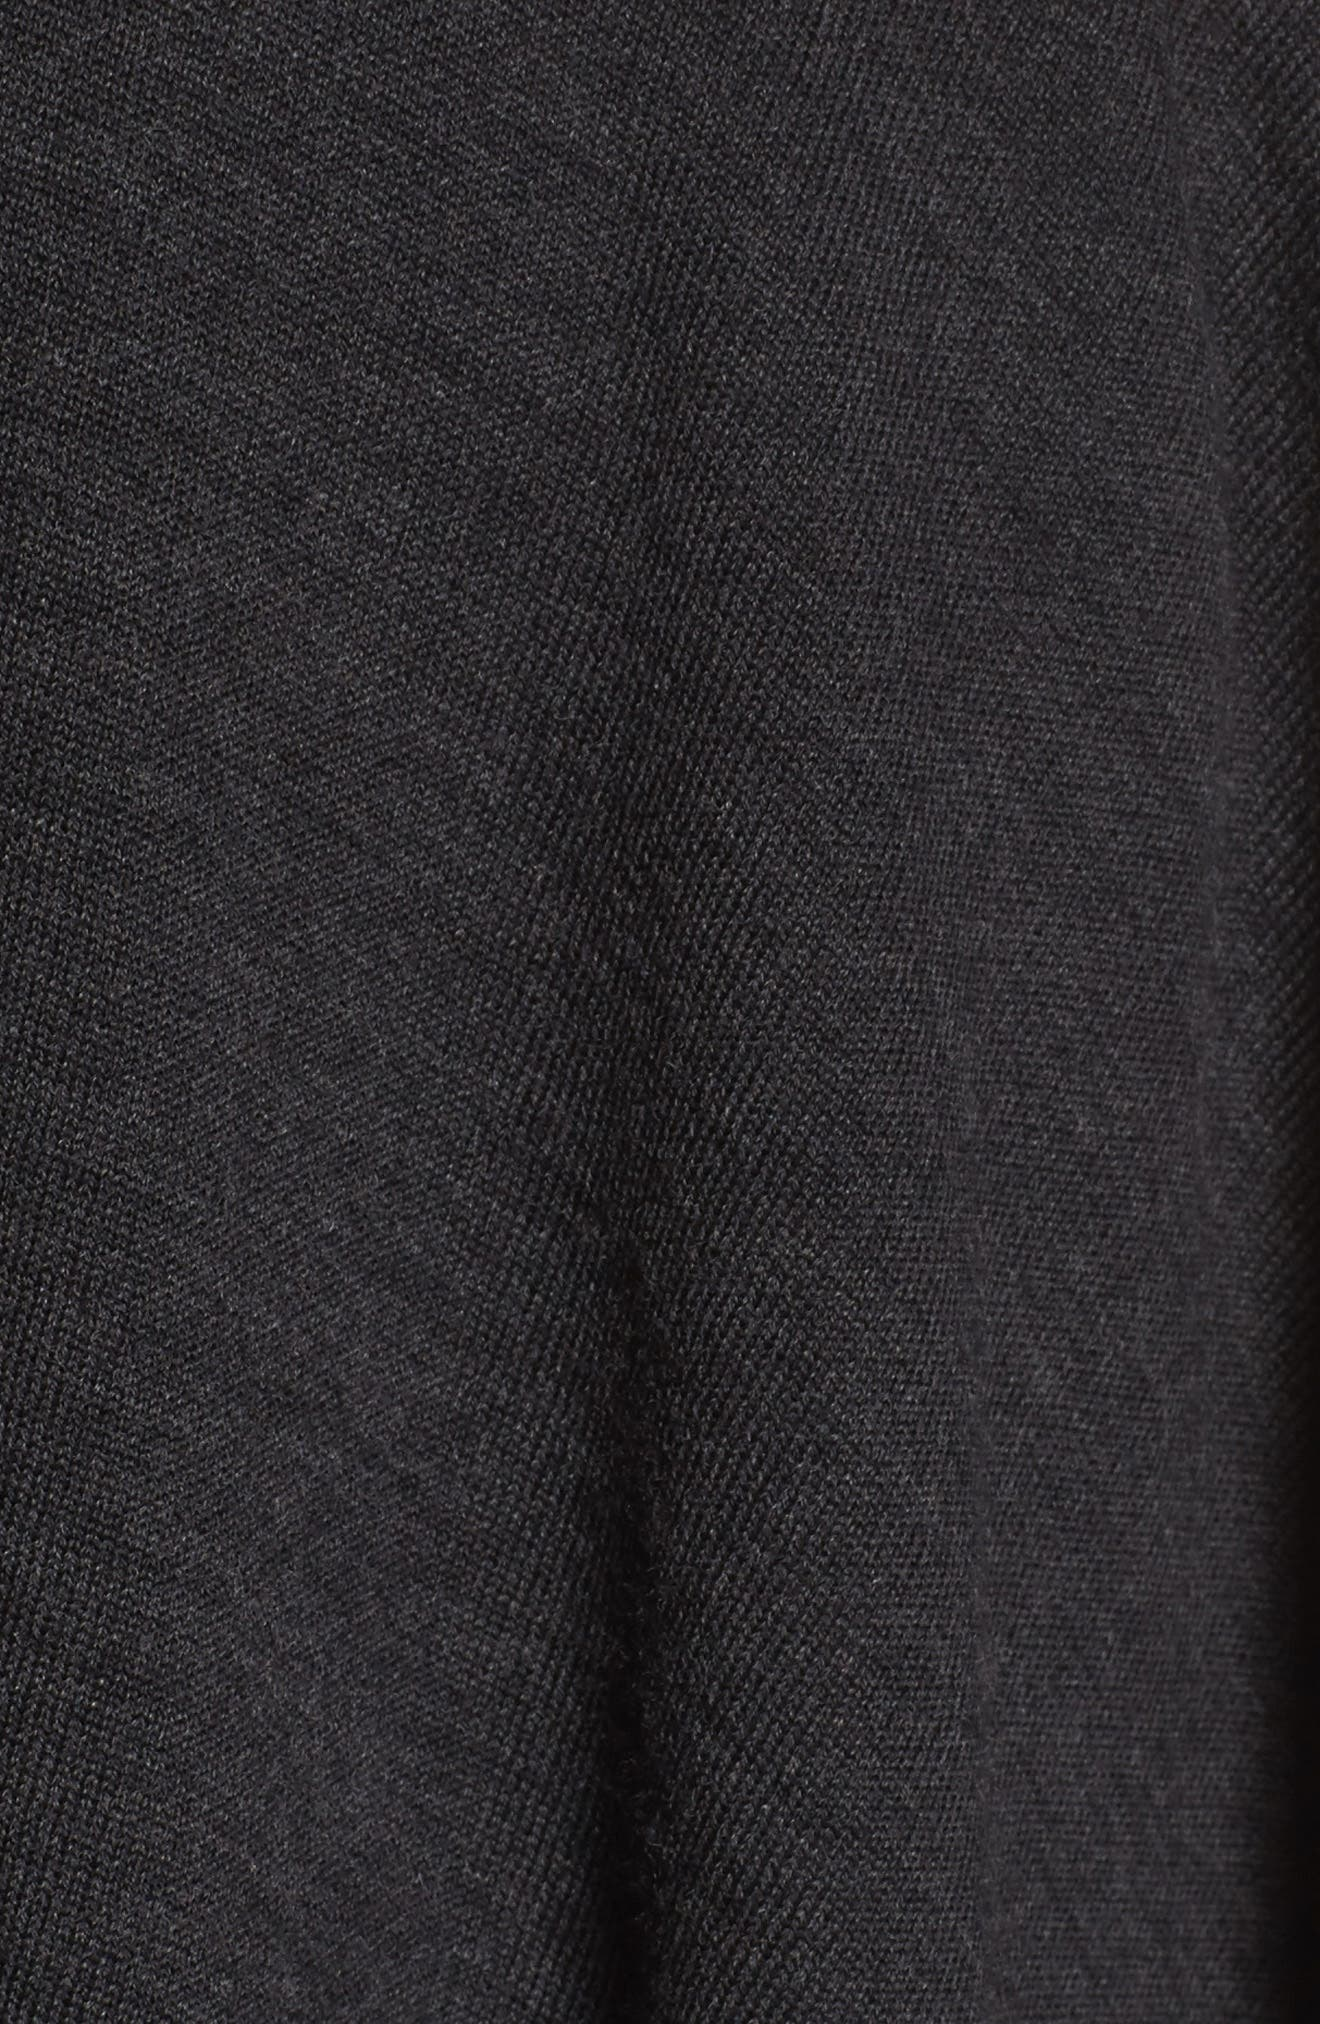 Reversible Wool Blend Serape,                             Alternate thumbnail 5, color,